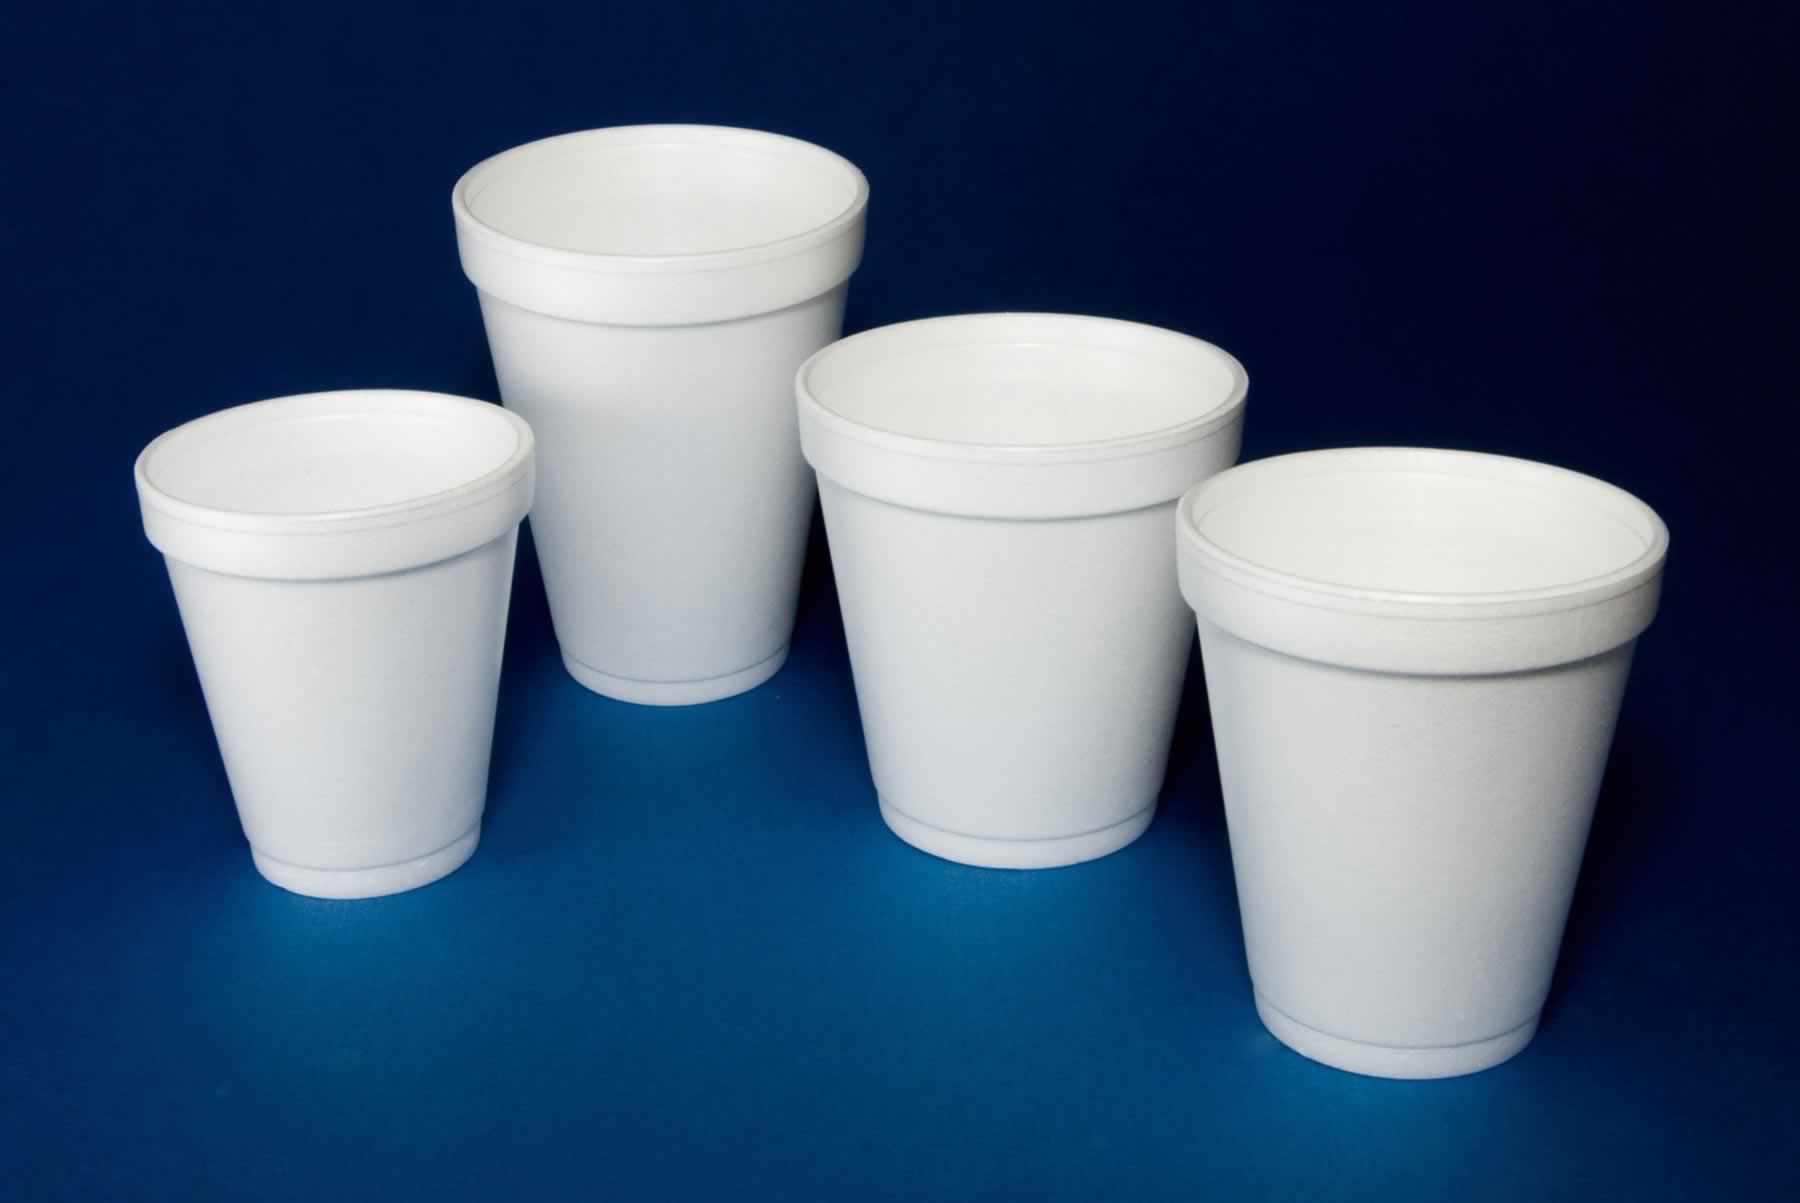 styrofoam-cups.jpg